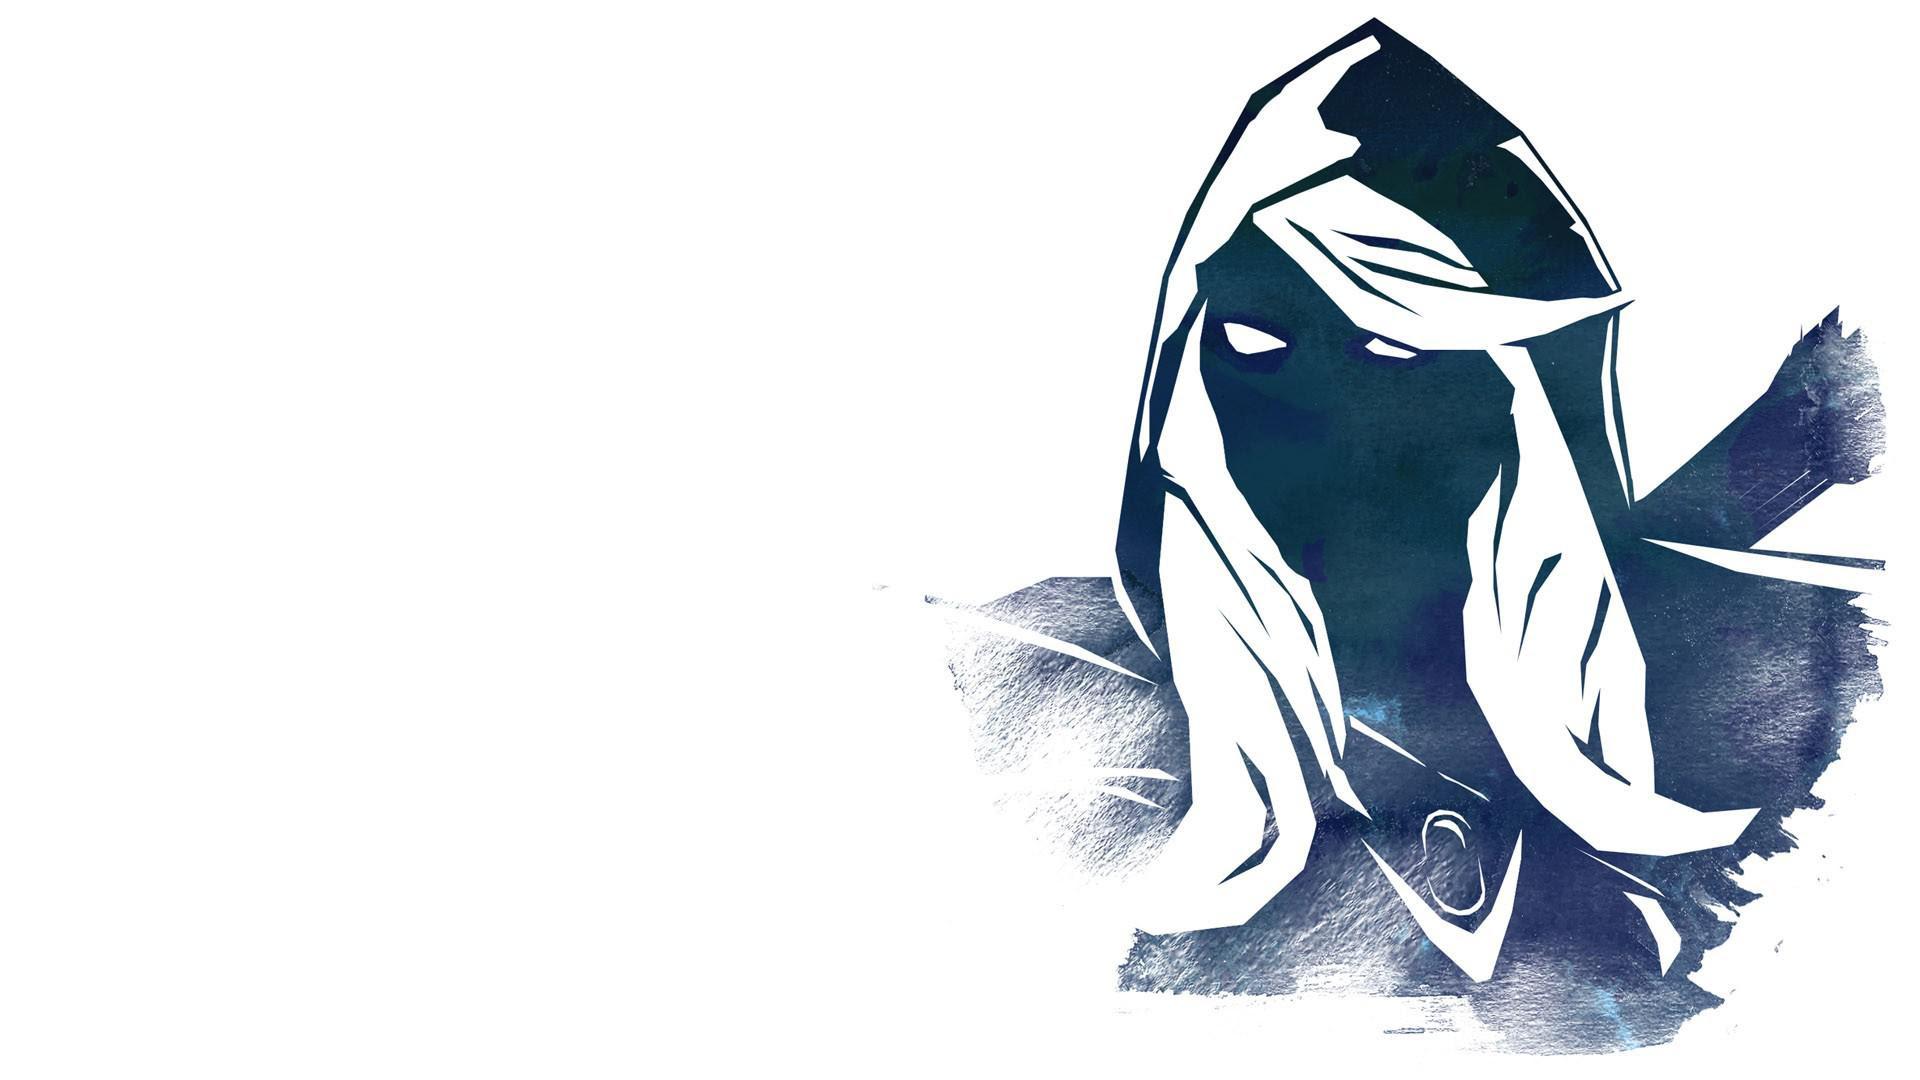 Hd Video Games Valve Corporation Dota Drow Vidya White Background